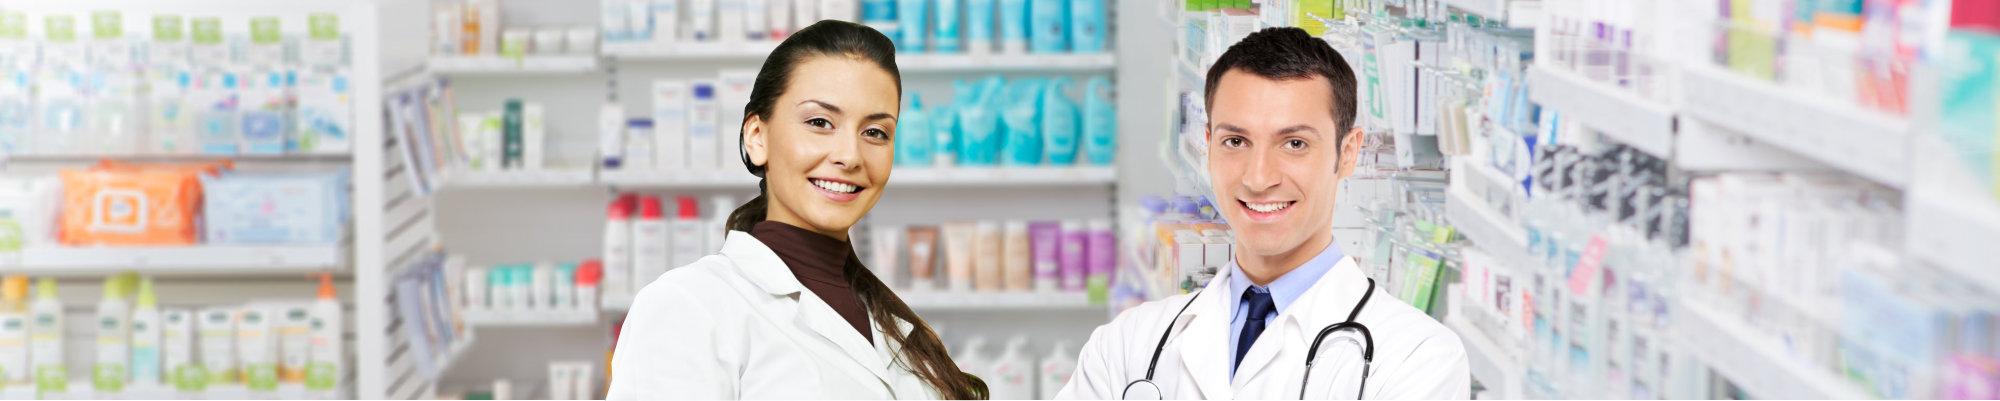 Male and Female Pharmacists